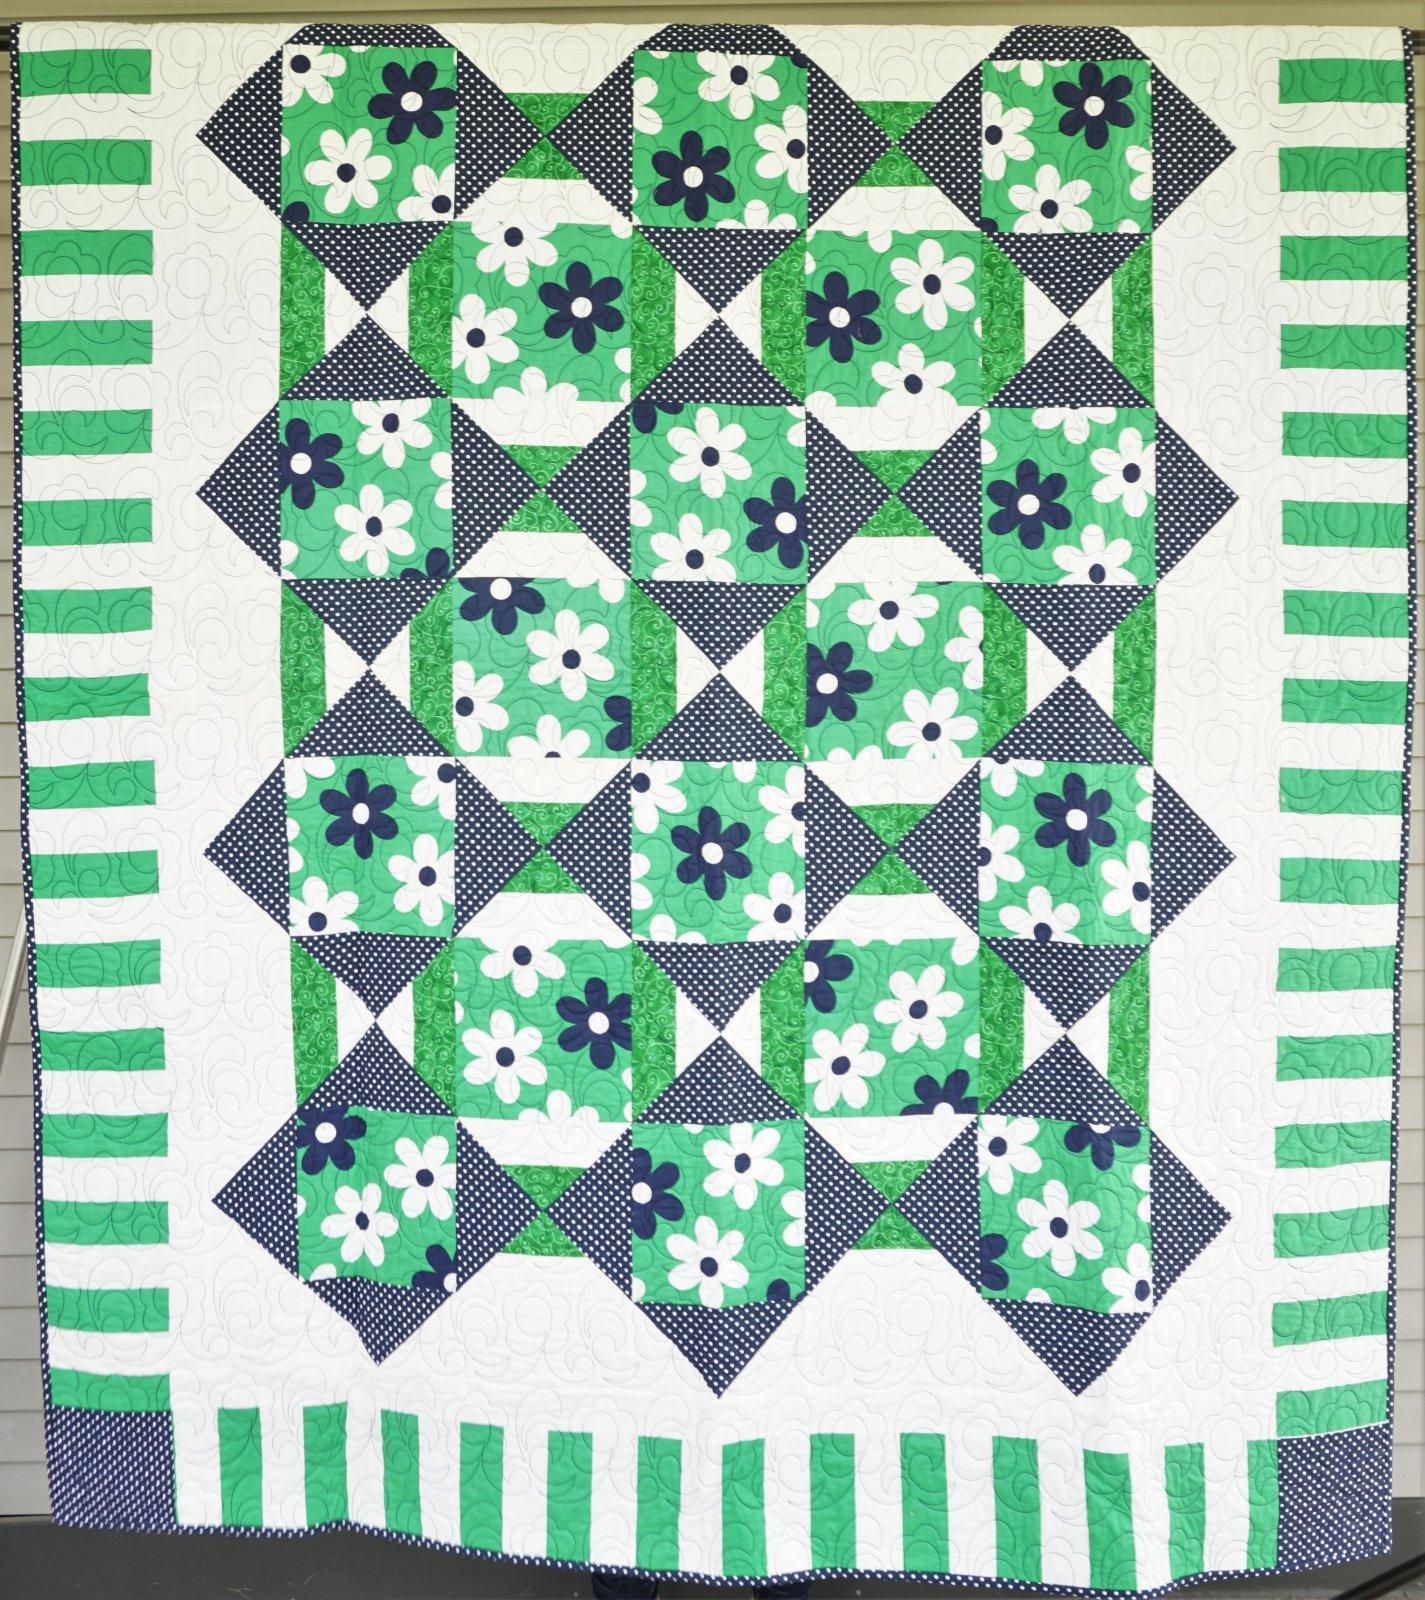 Sample-Green Blue & White Floral Lap Quilt 64W x 78L